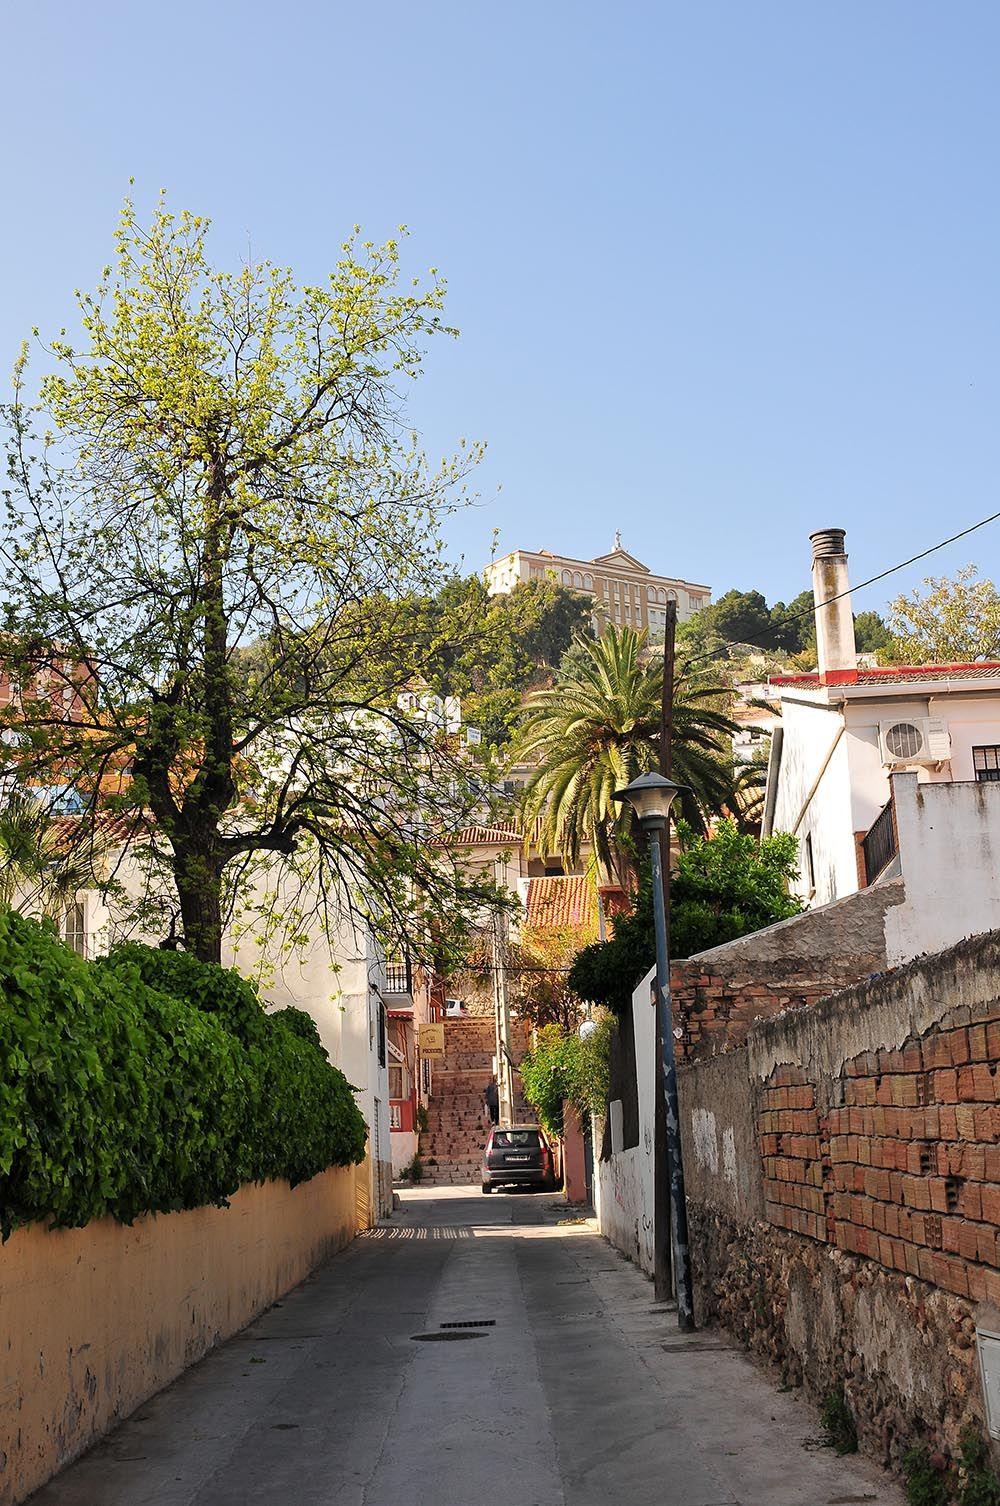 quartier aux abords du bord de mer Malaga